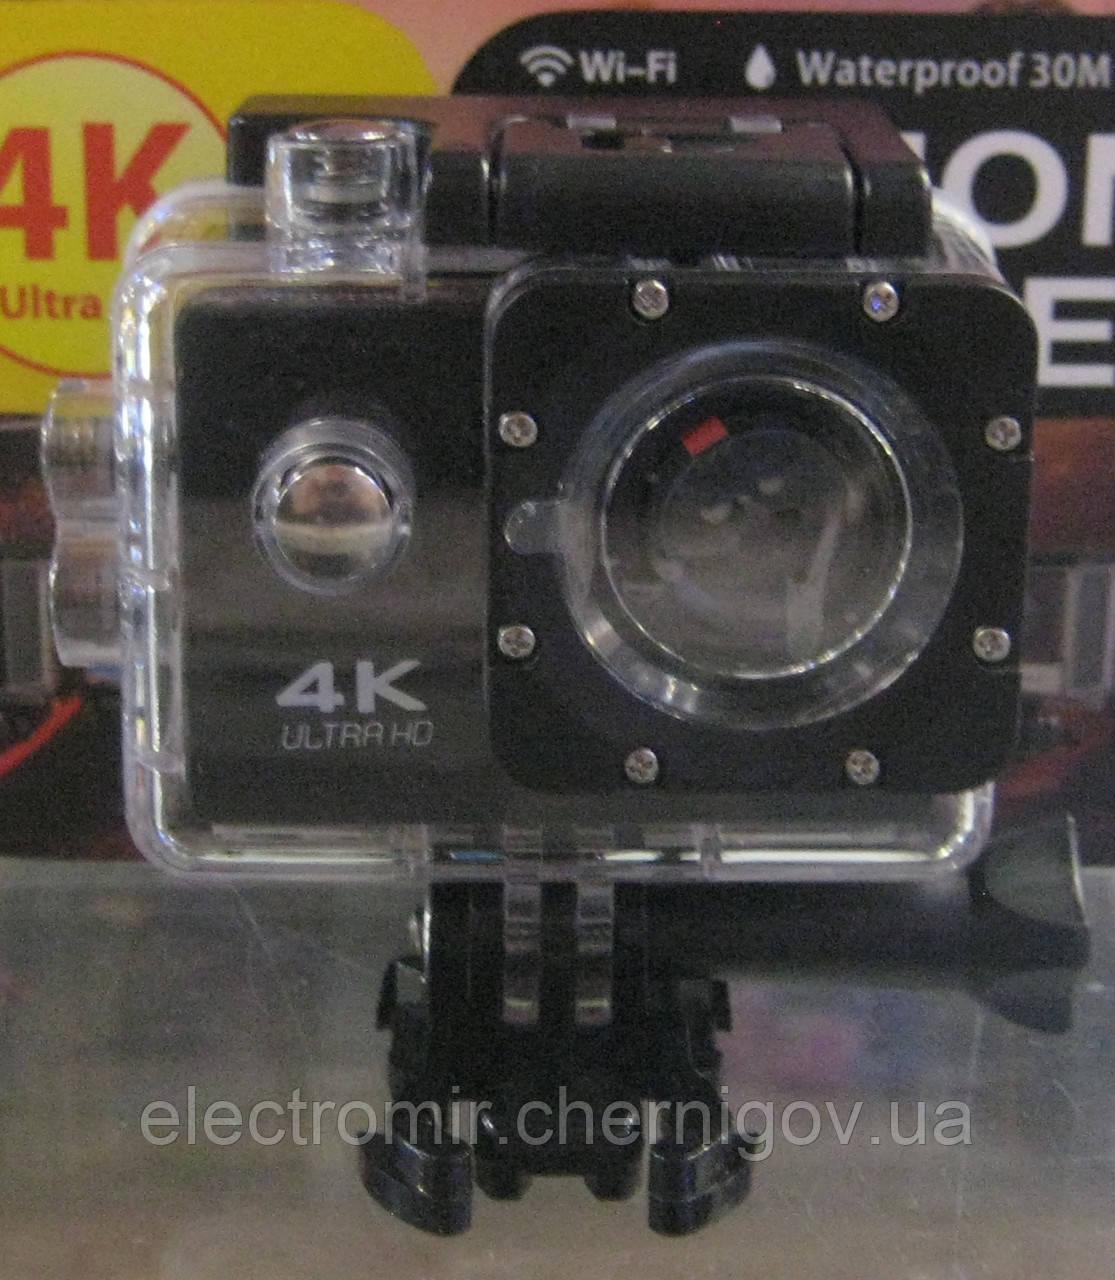 Экшн камера S2 (4K, Wi-Fi)